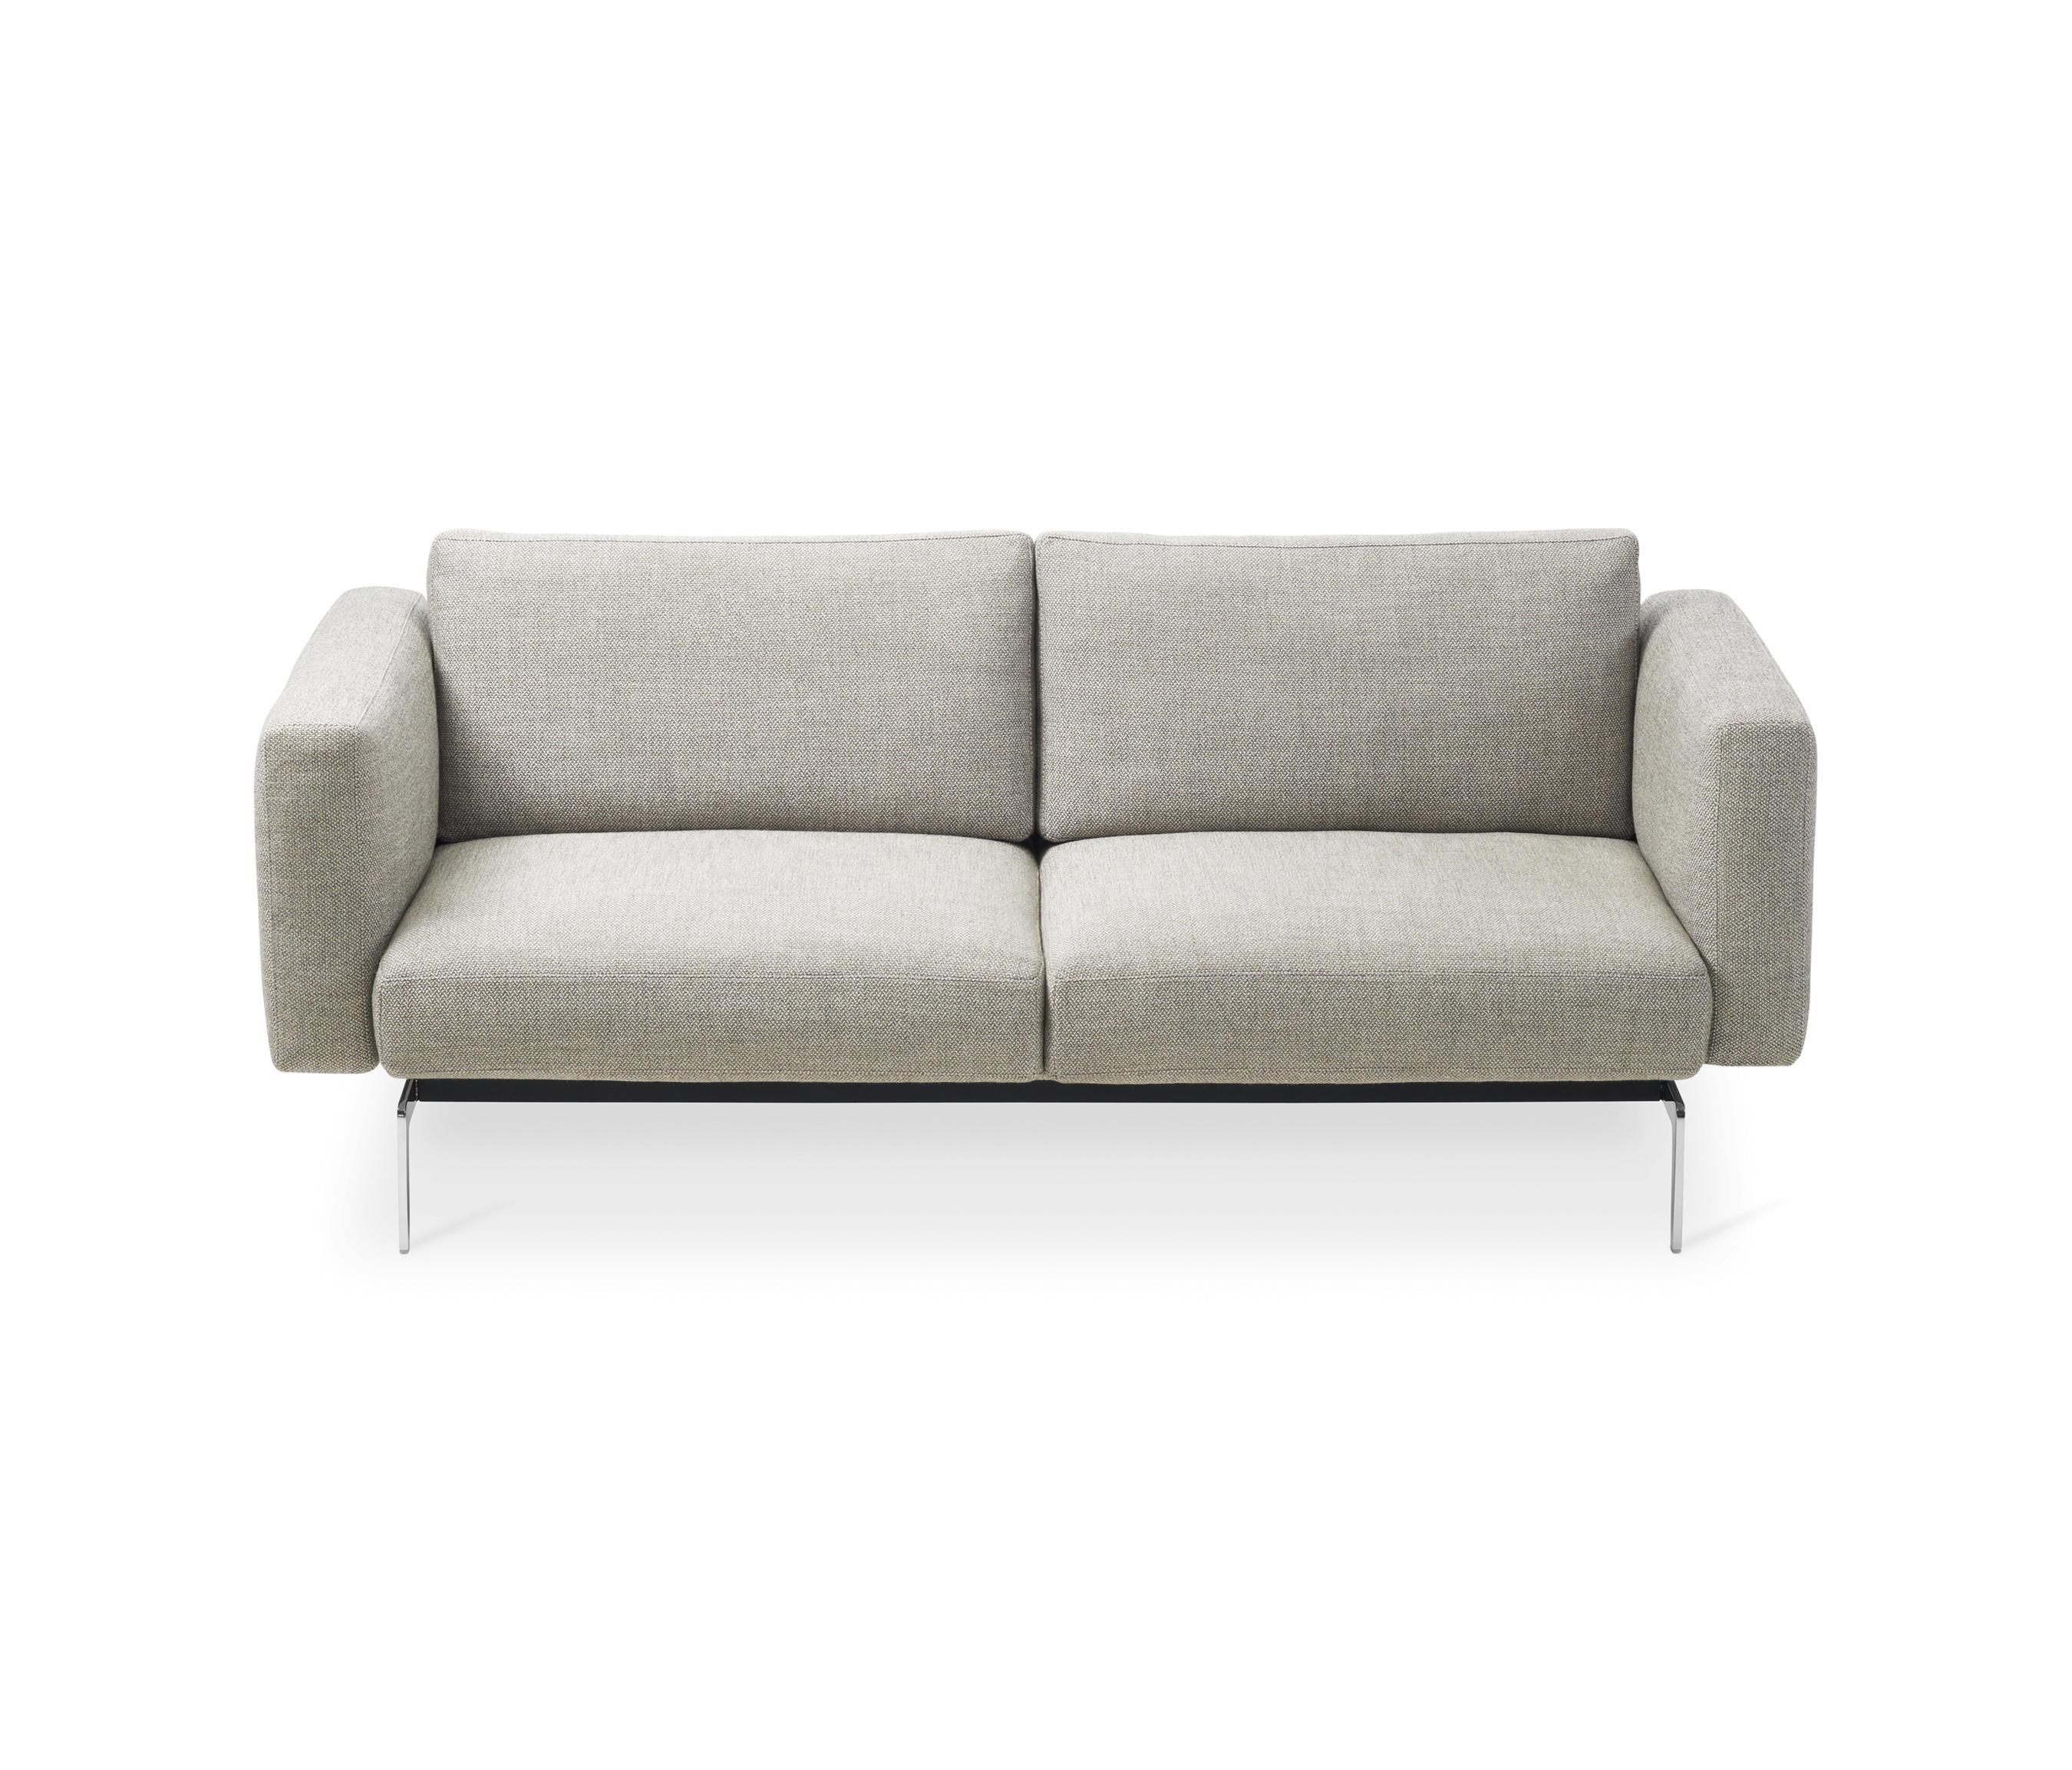 sofa 3m breit amazing ecksofas with sofa 3m breit great top ergebnis schn big sofa breit bild. Black Bedroom Furniture Sets. Home Design Ideas